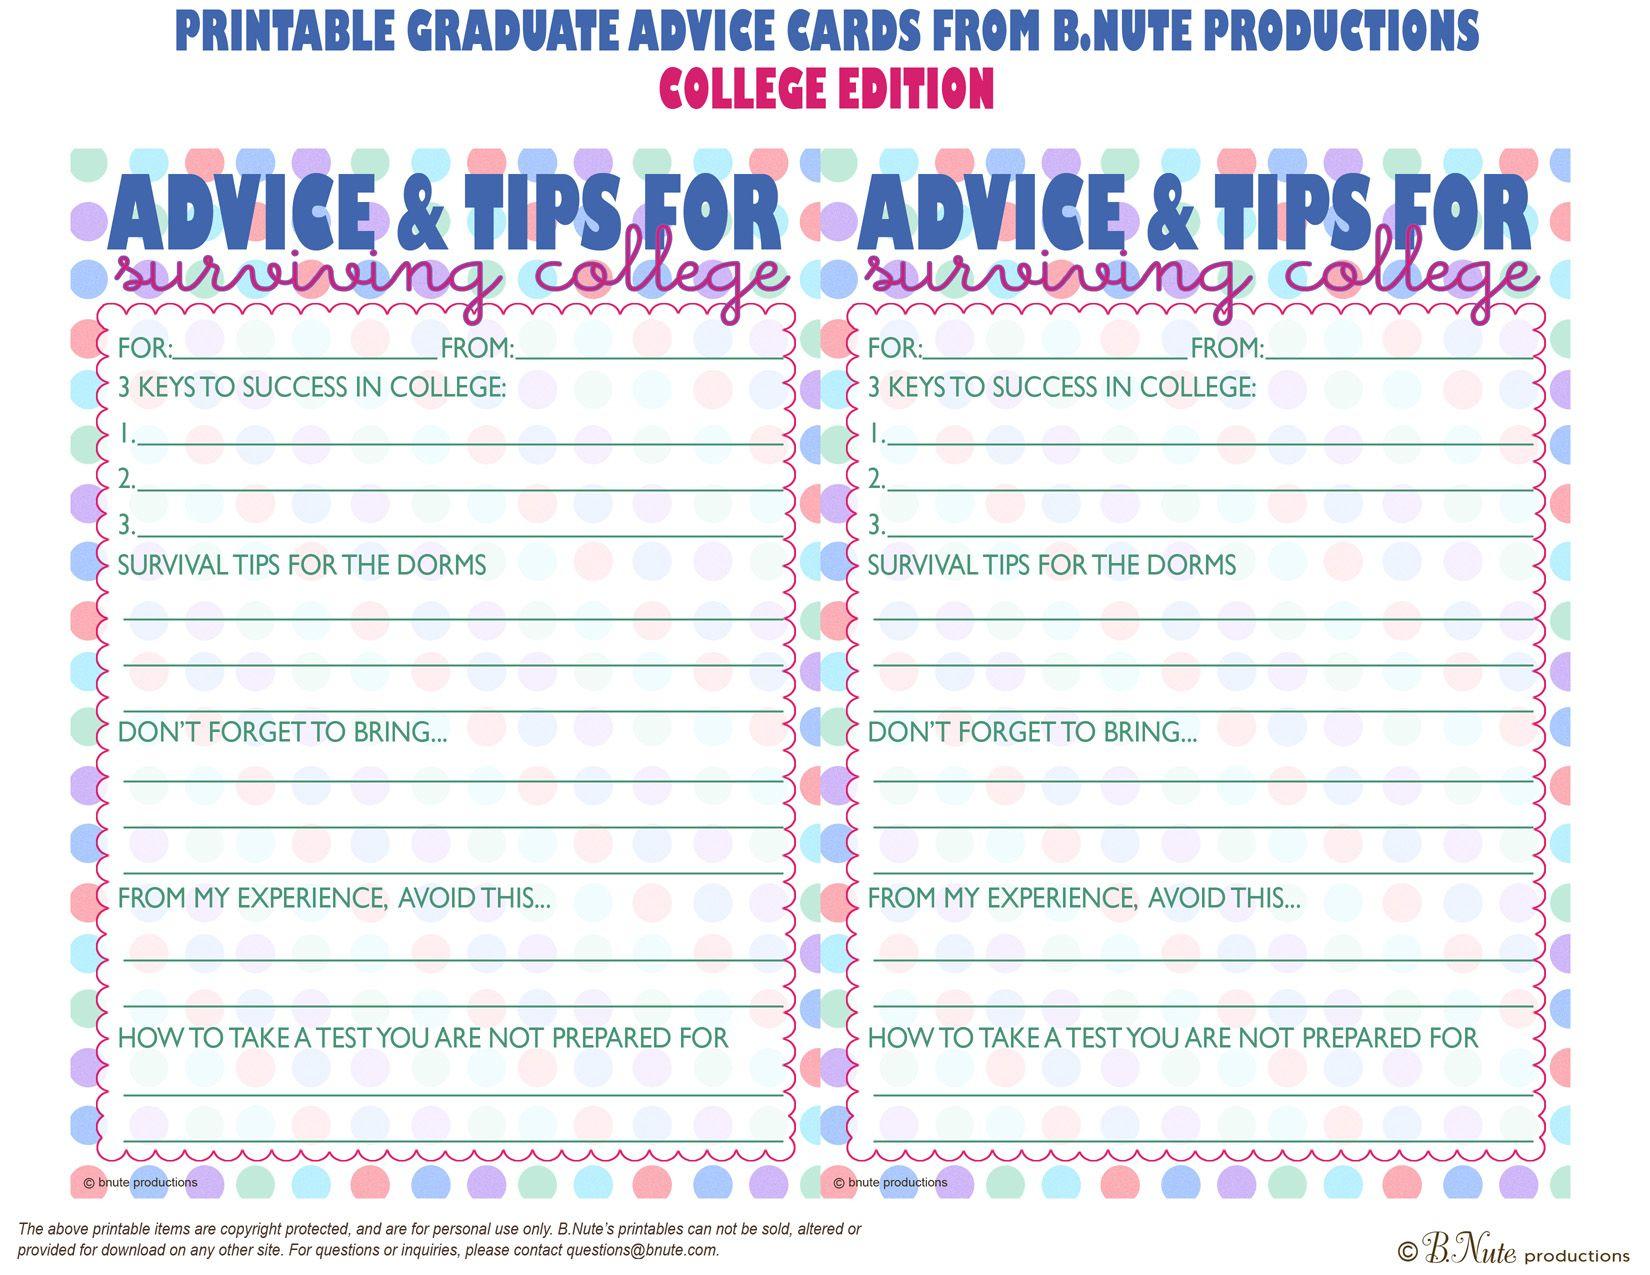 Free Printables | Free Printable Graduate Advice Cards - College - Free Printable Graduation Advice Cards